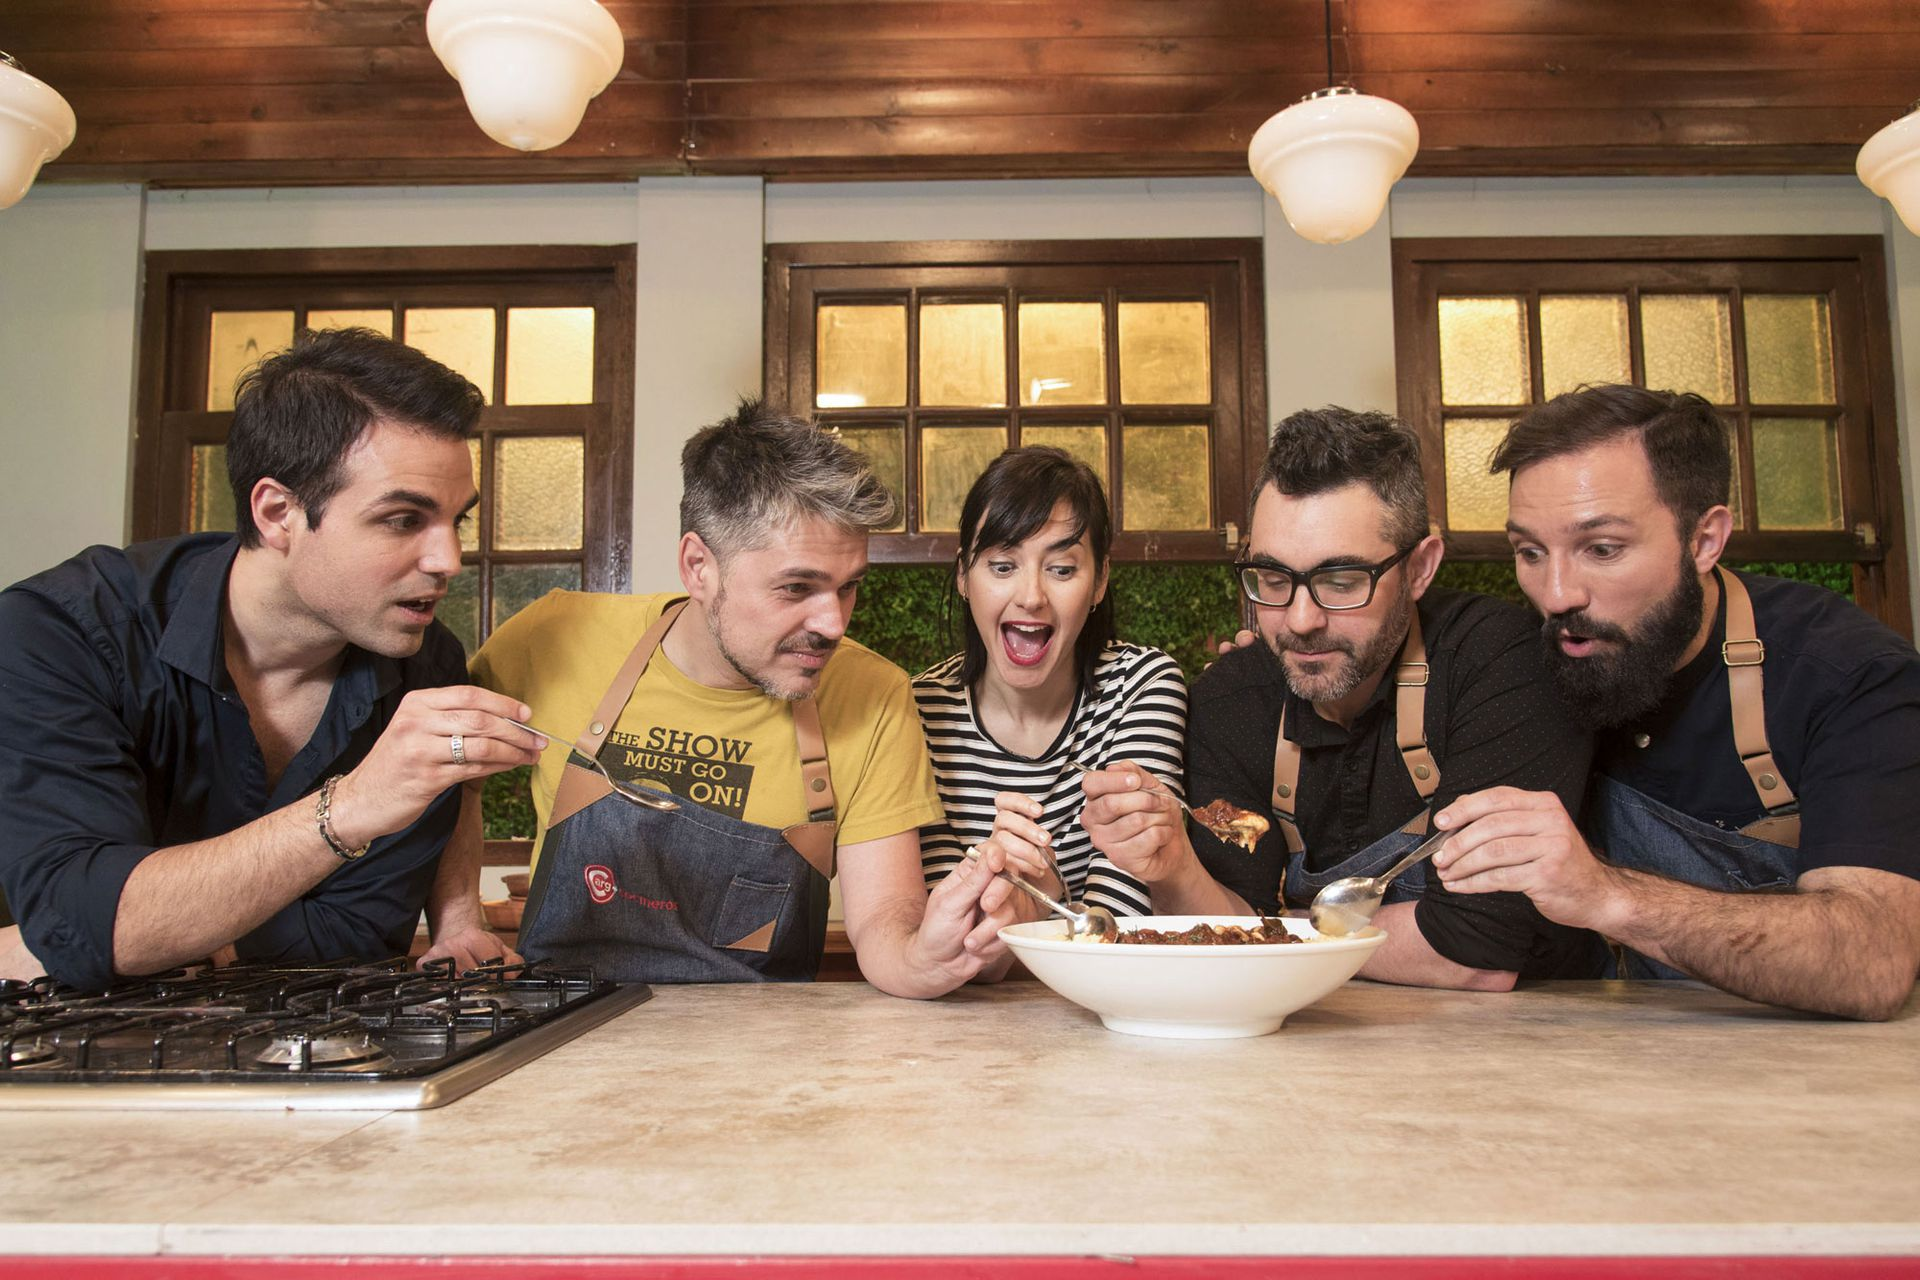 Cocineros que se divierten e informan